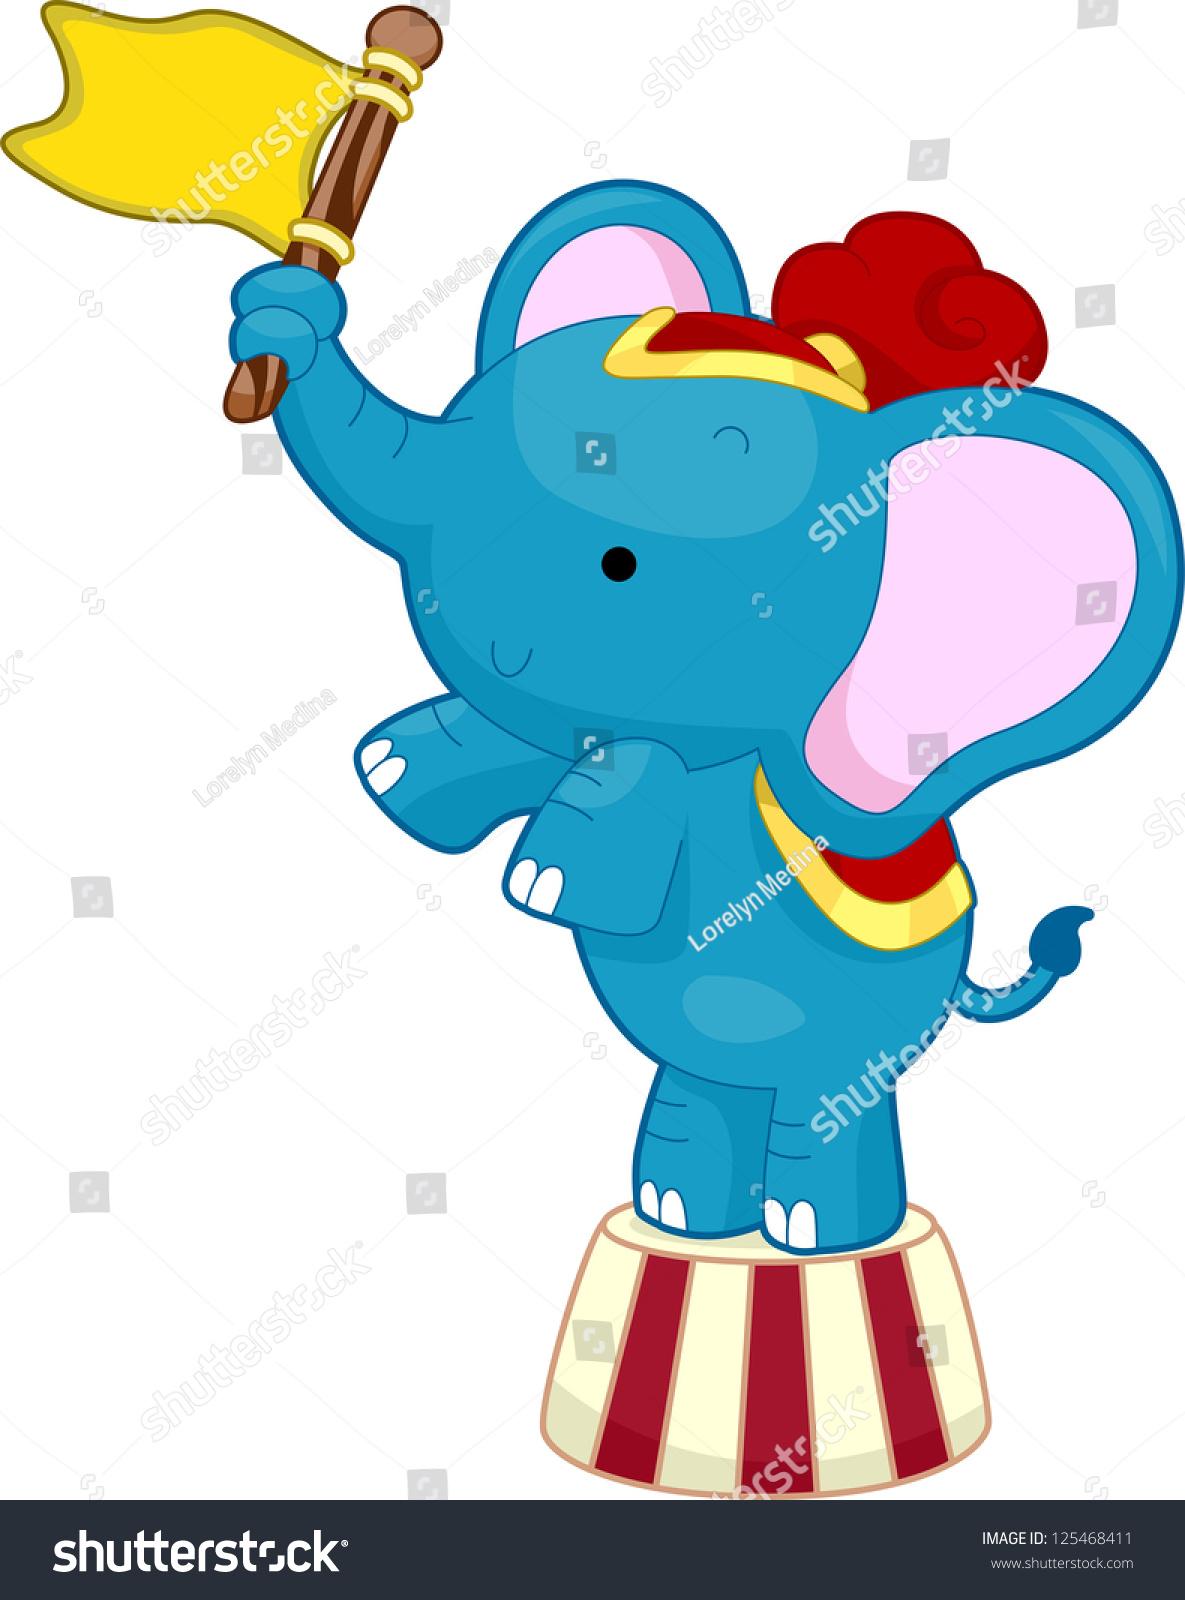 ppt 可爱大象